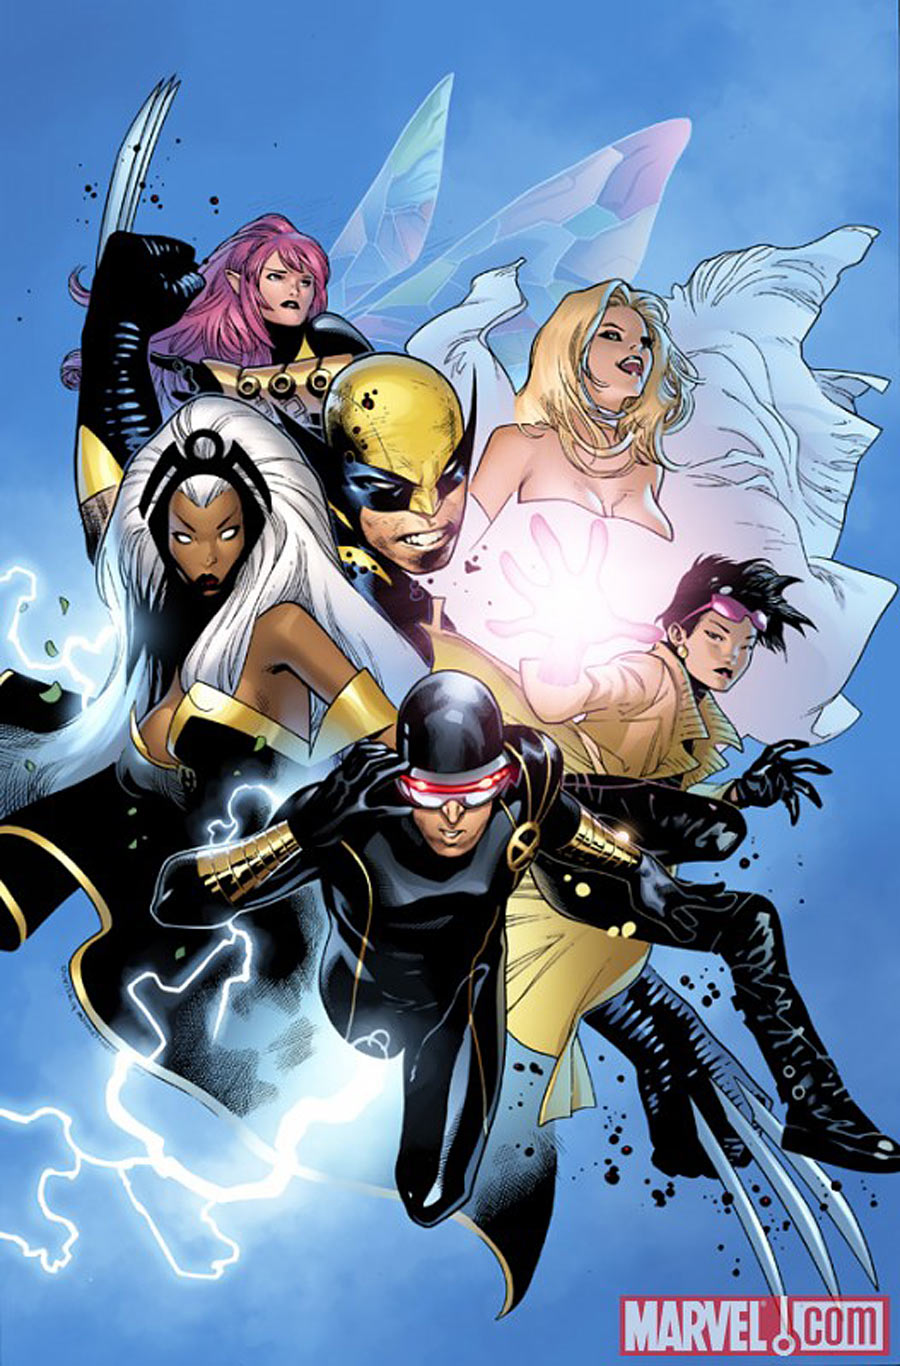 X-Men Vol 3 1 Olivier Coipel Variant Textless.jpg